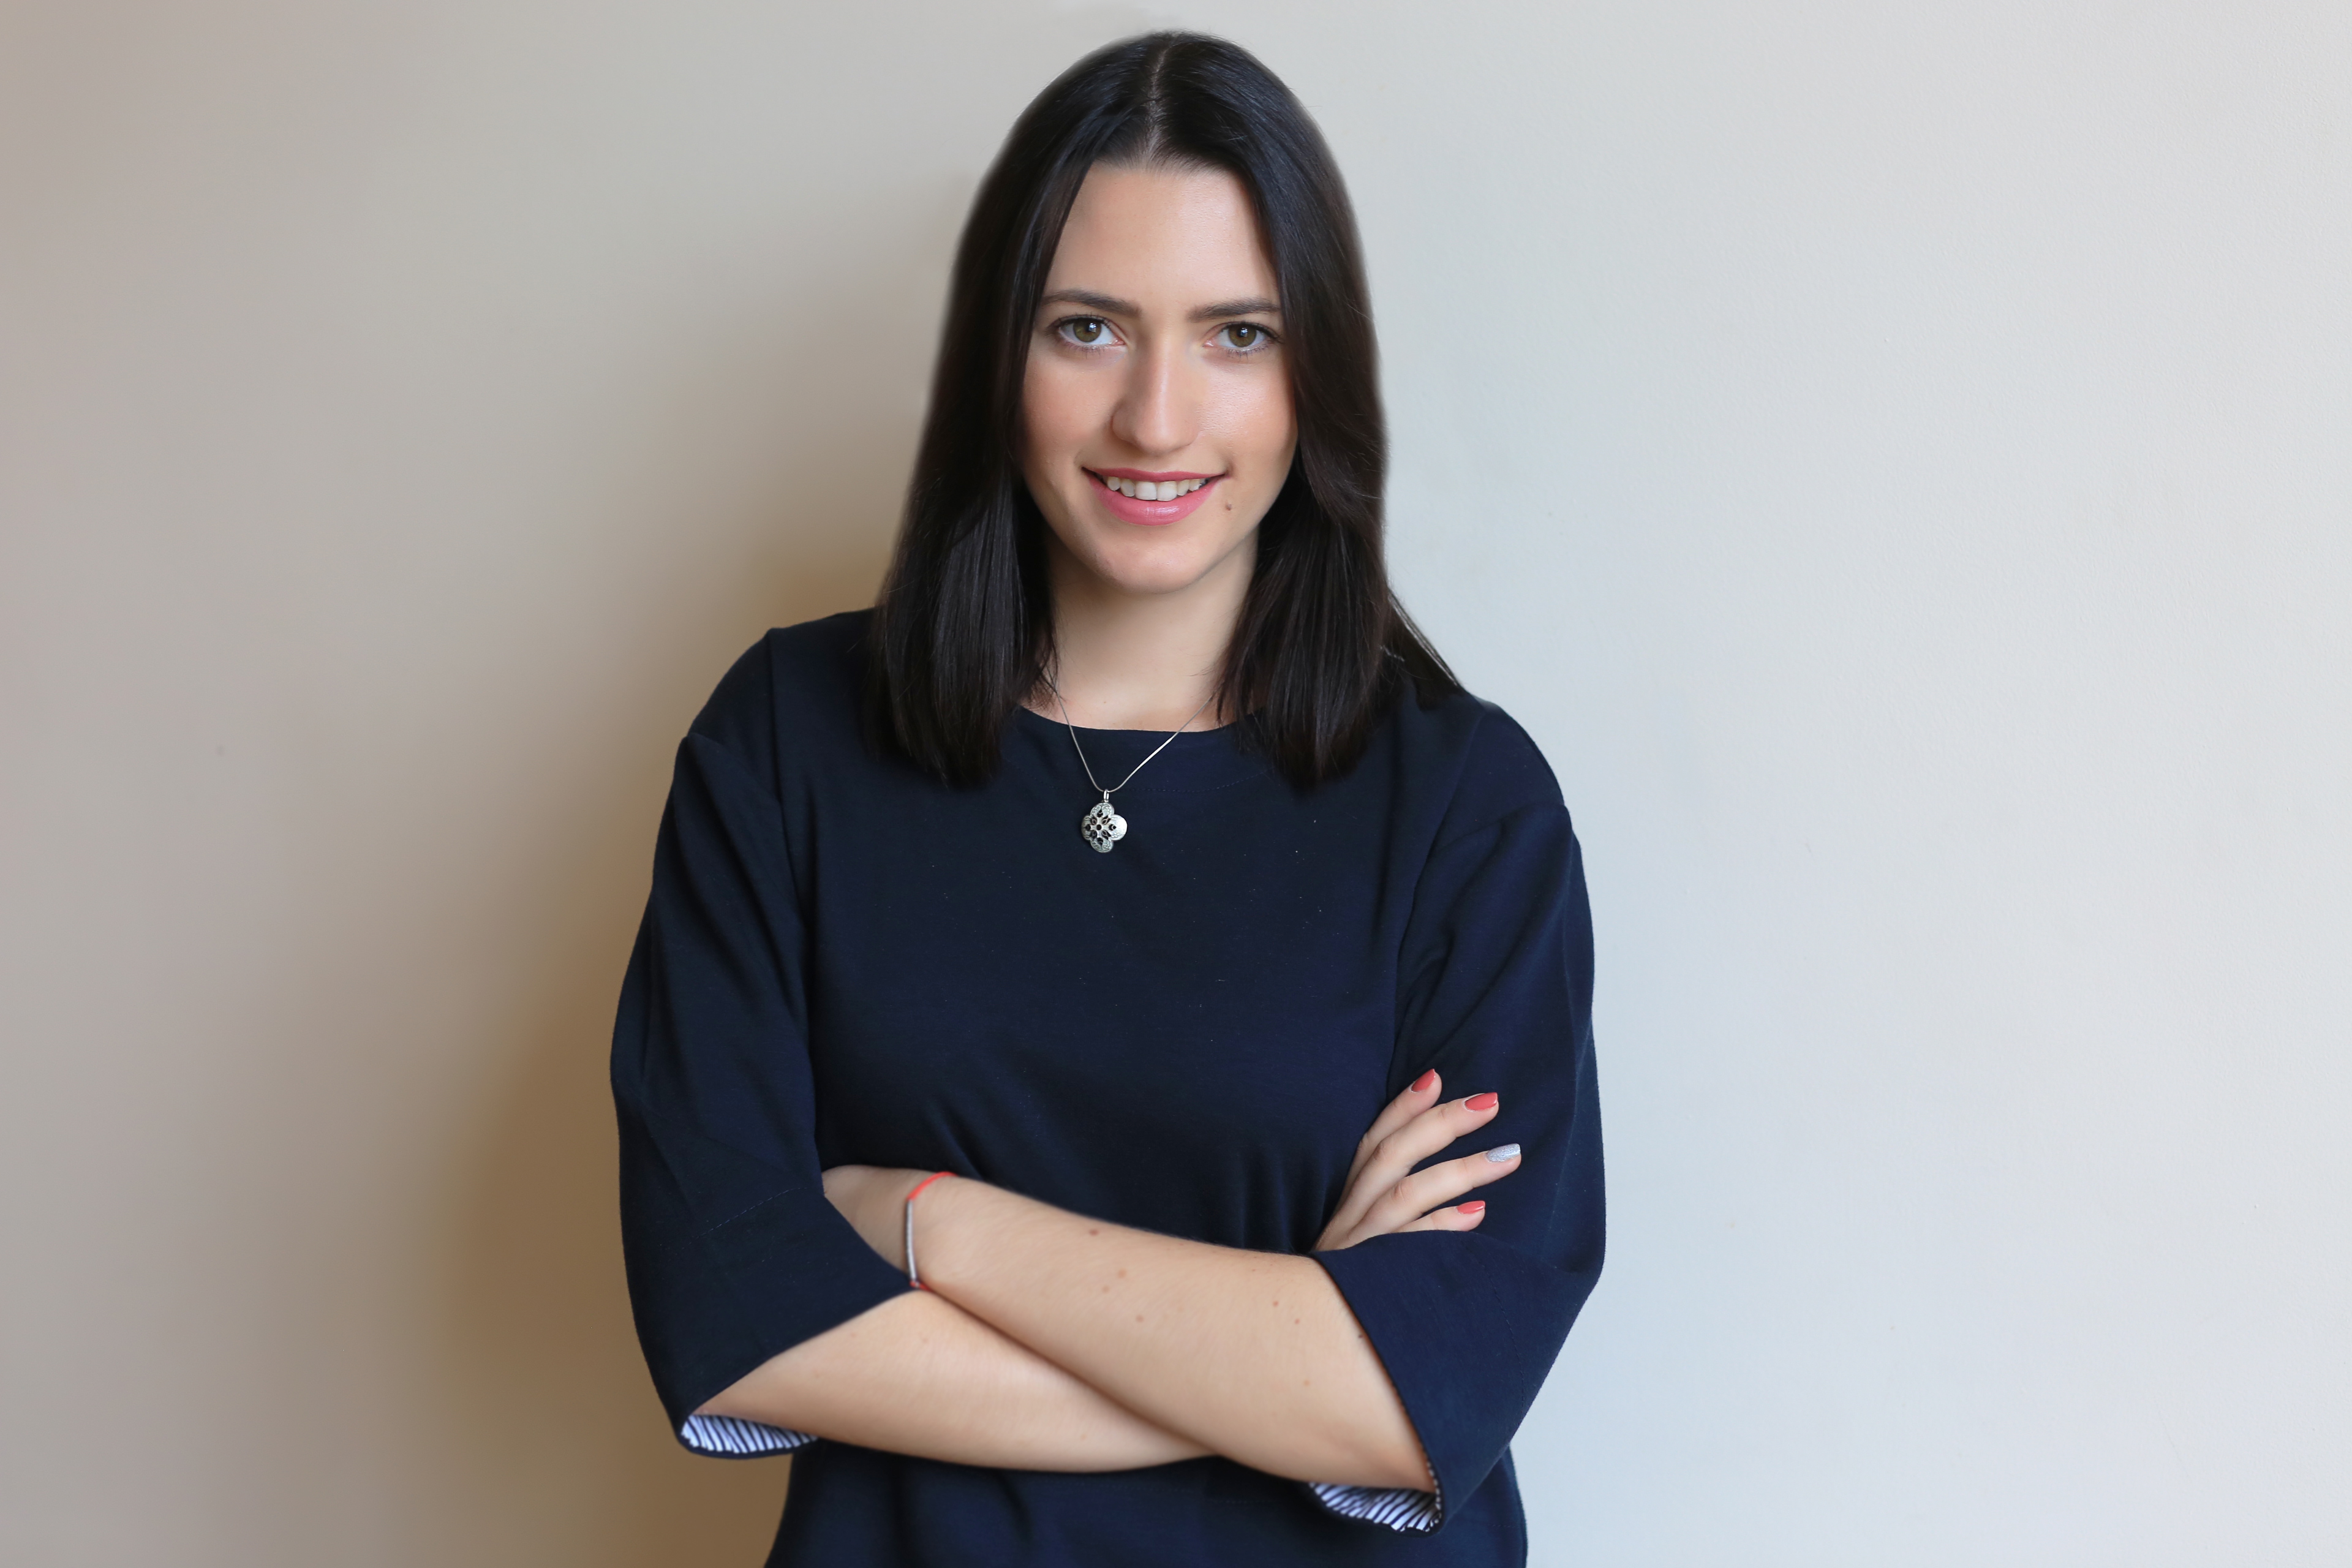 Гусєва Вероніка Олександрівна